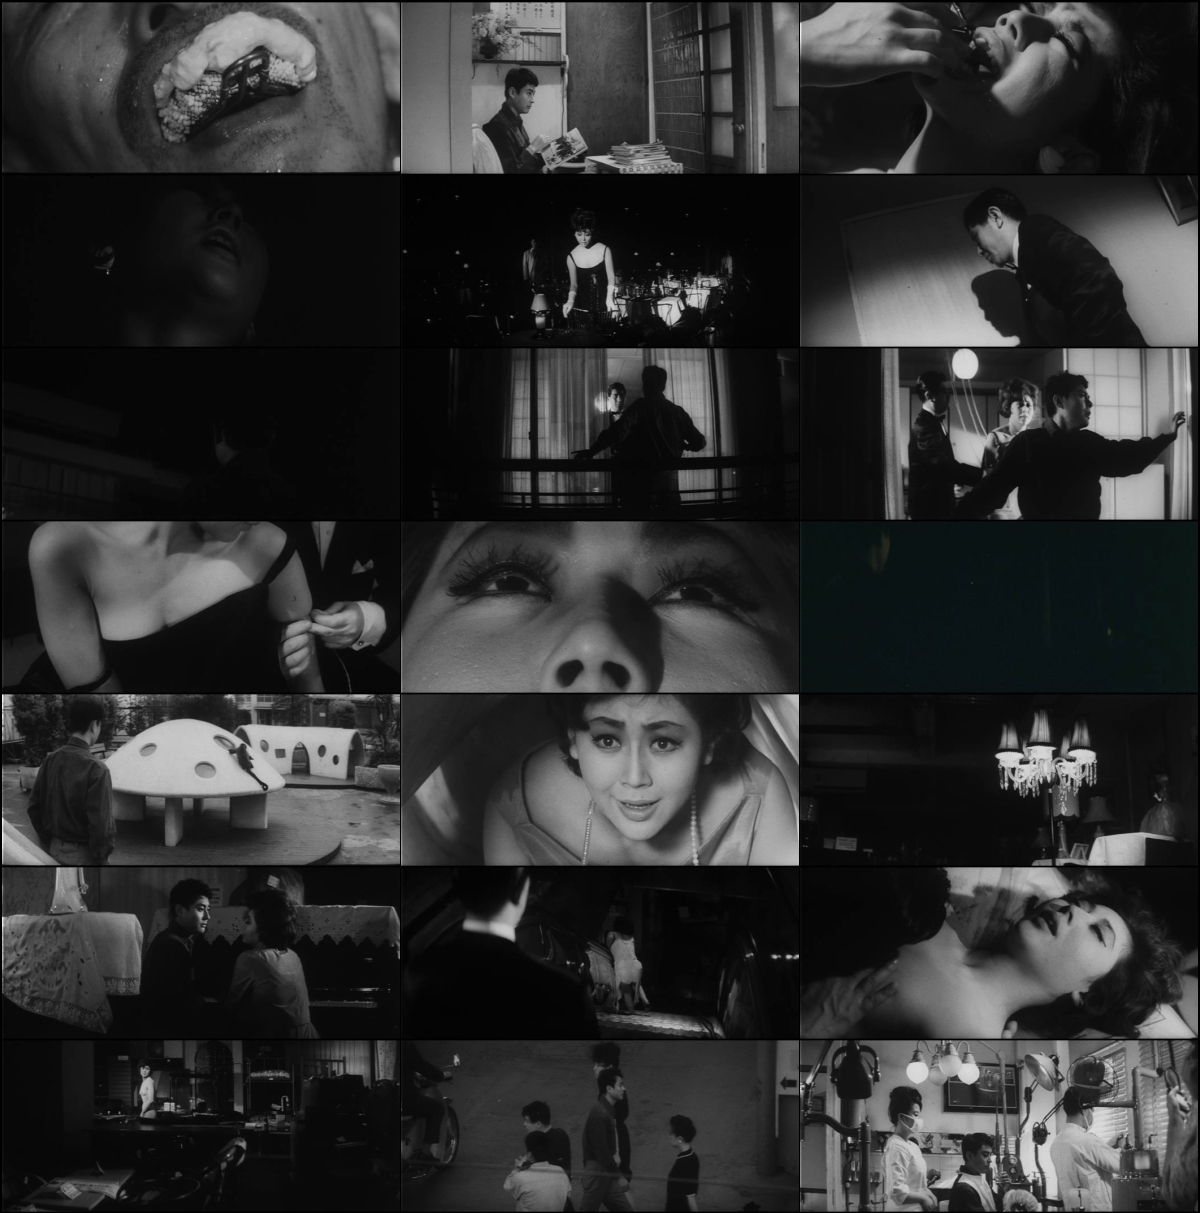 daydream-1964